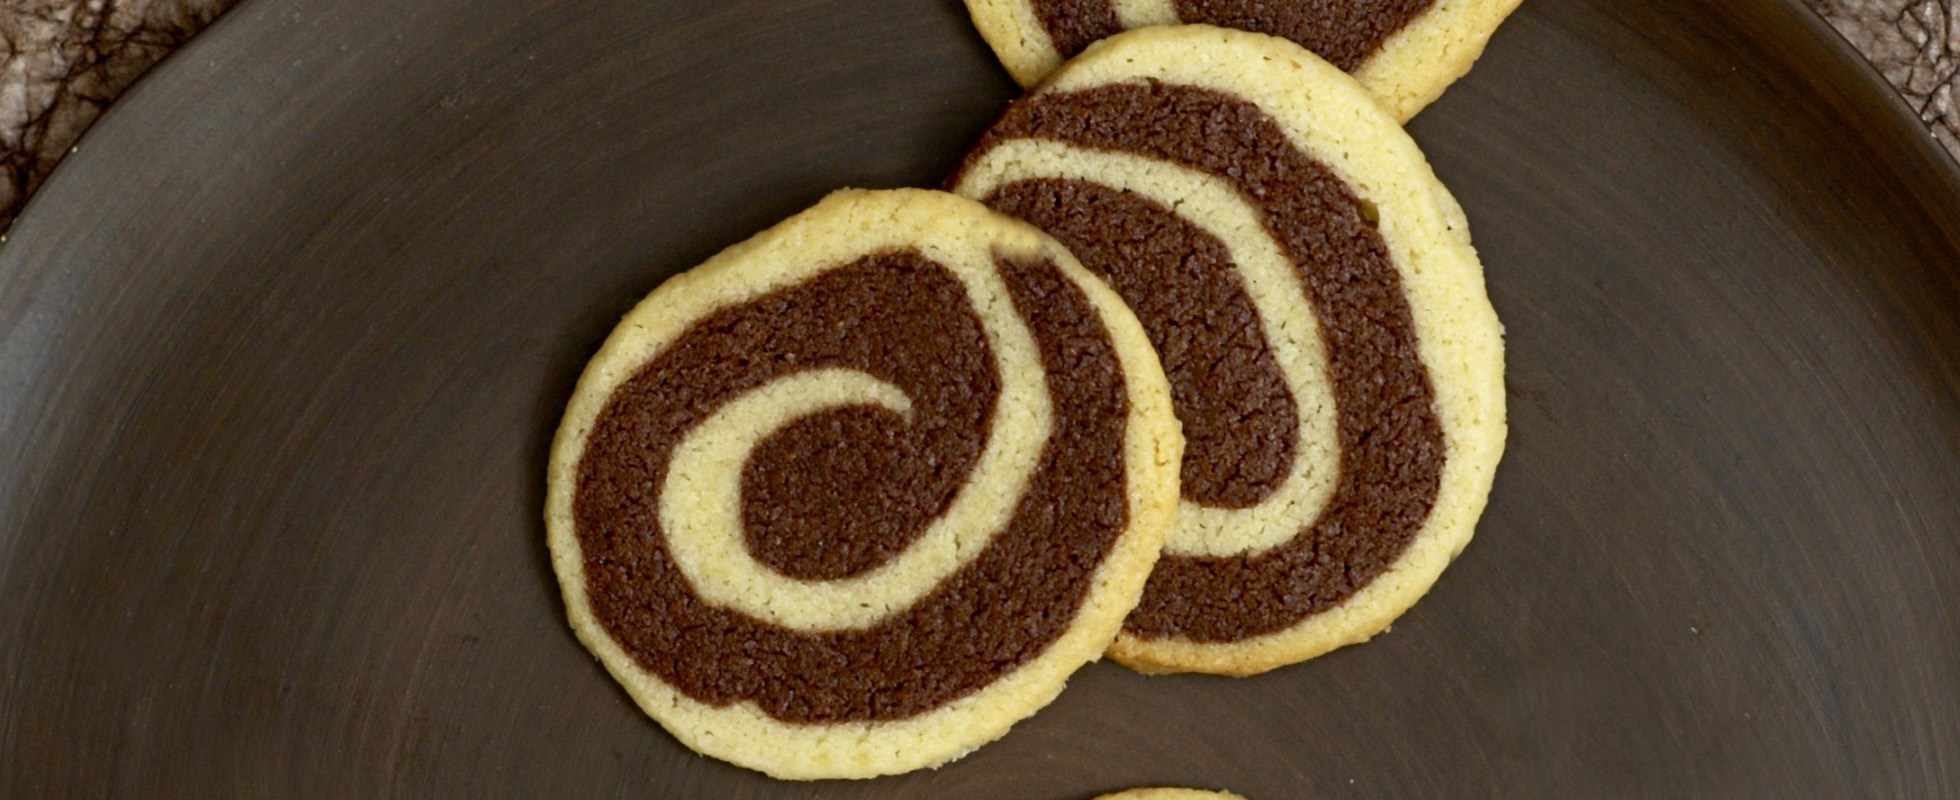 Black and white pinwheel cookies